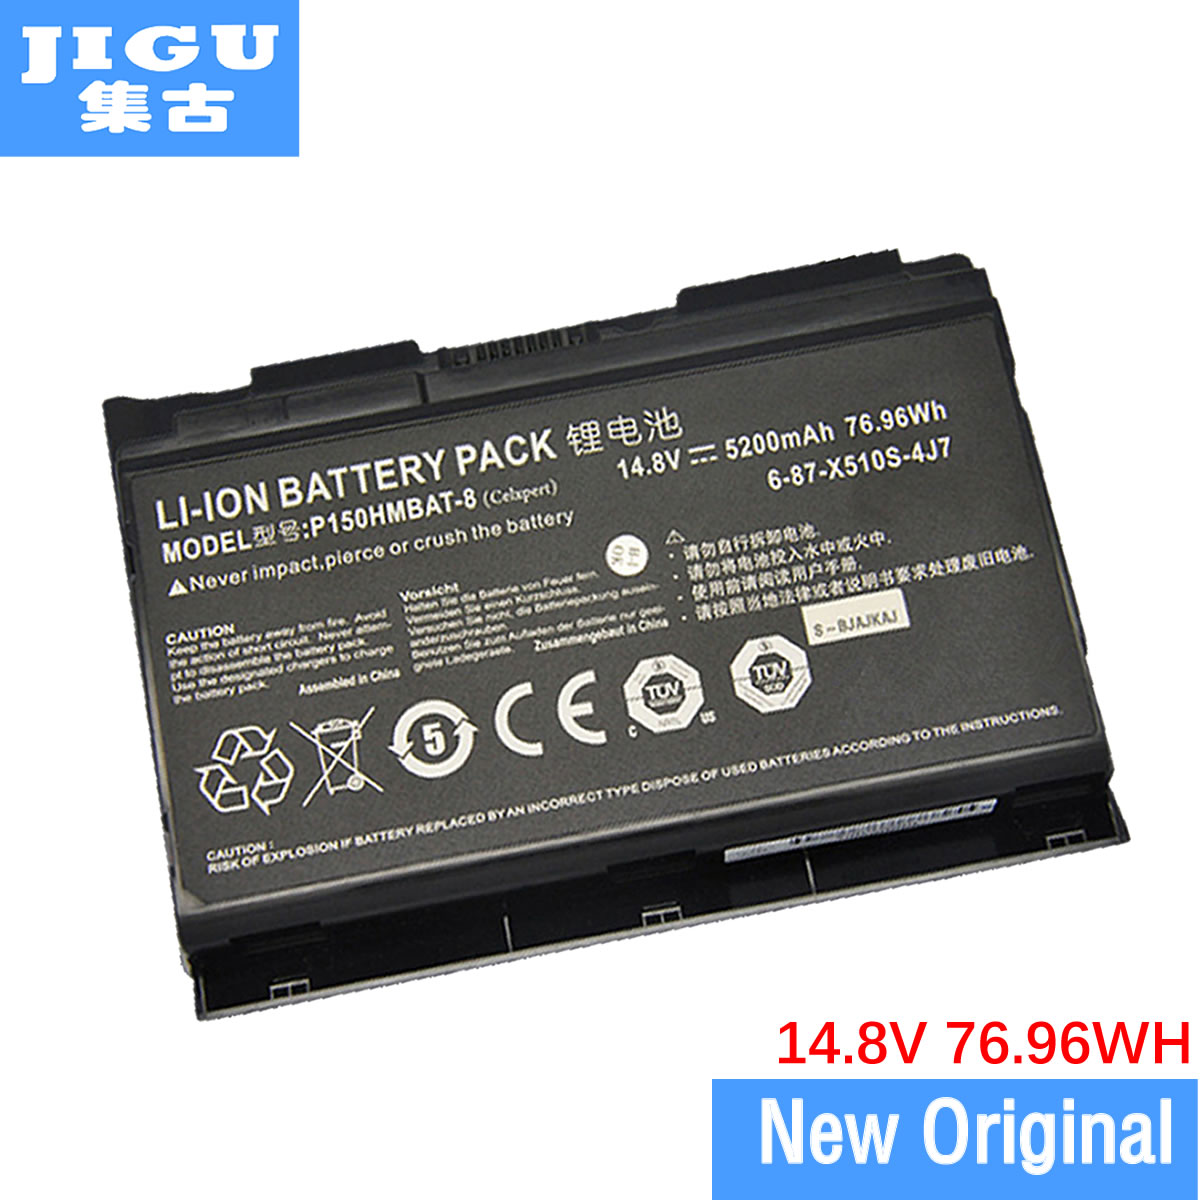 JIGU 14,8 V 76.96WH 6-87-X510S-4D7 6-87-X510S-4J7 Original Tablet batería para CLEVO P150 P150EM P170HM3 P170HM X511 serie